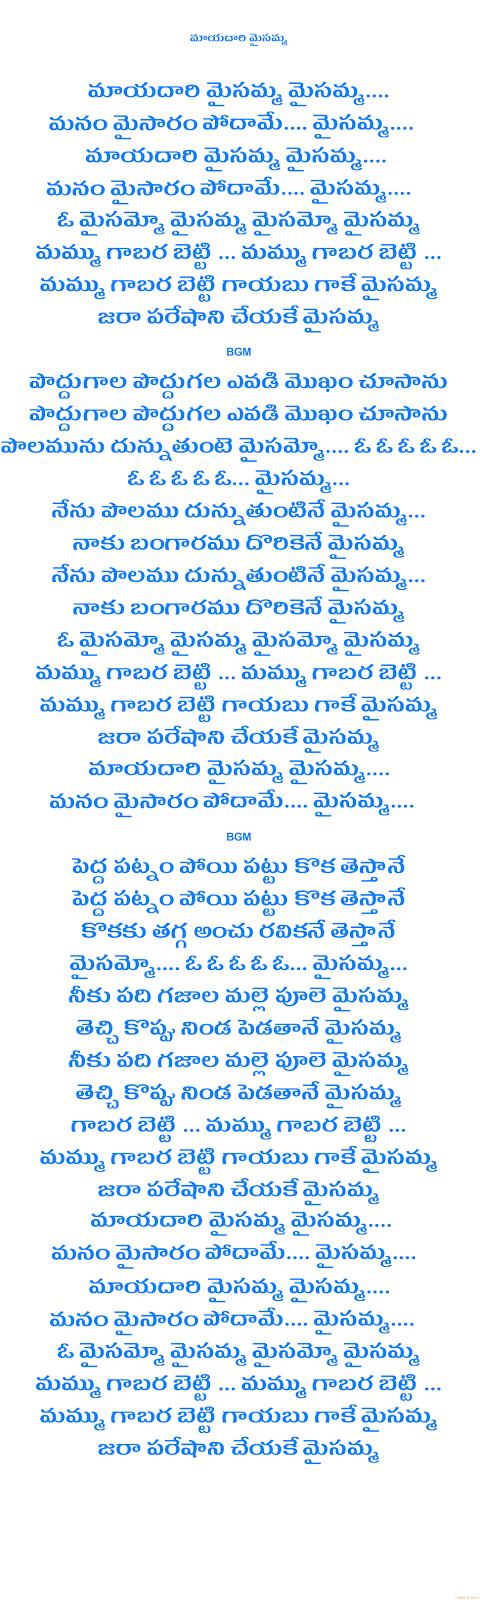 mayadari maisamma folk song lyrics telugu